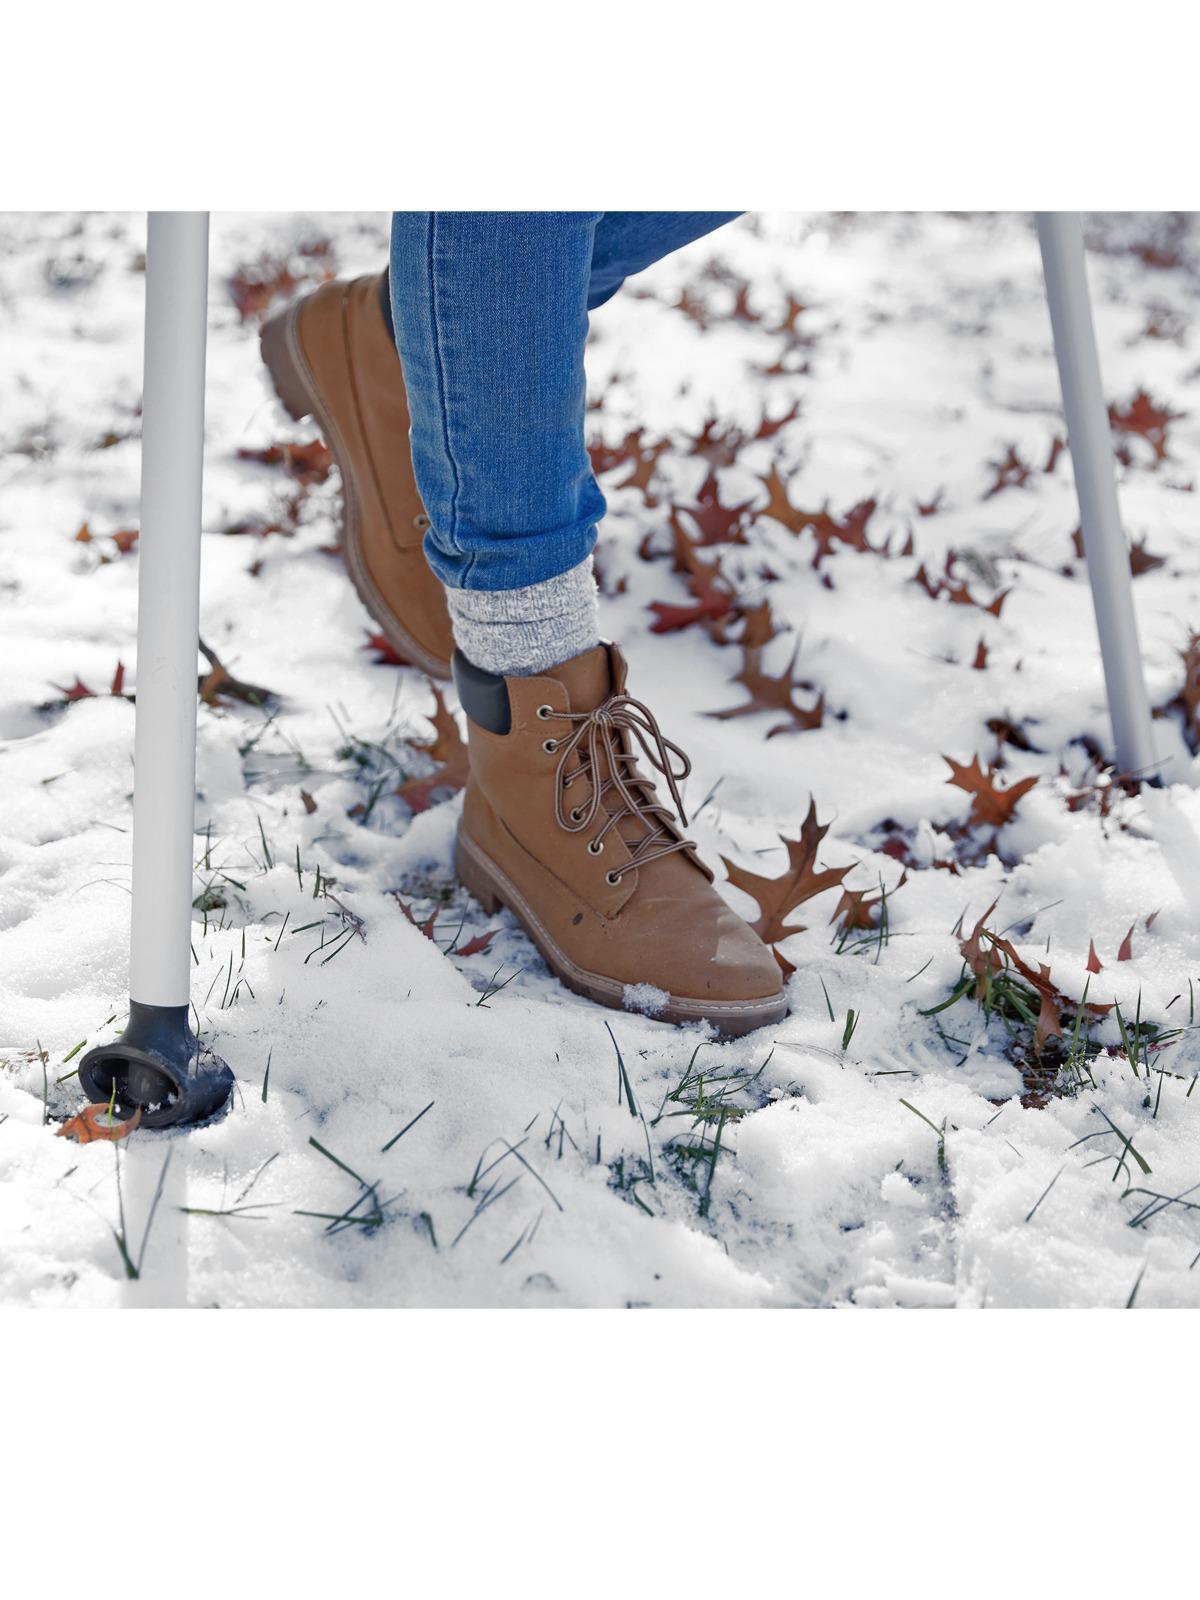 5014-Schnee.jpg